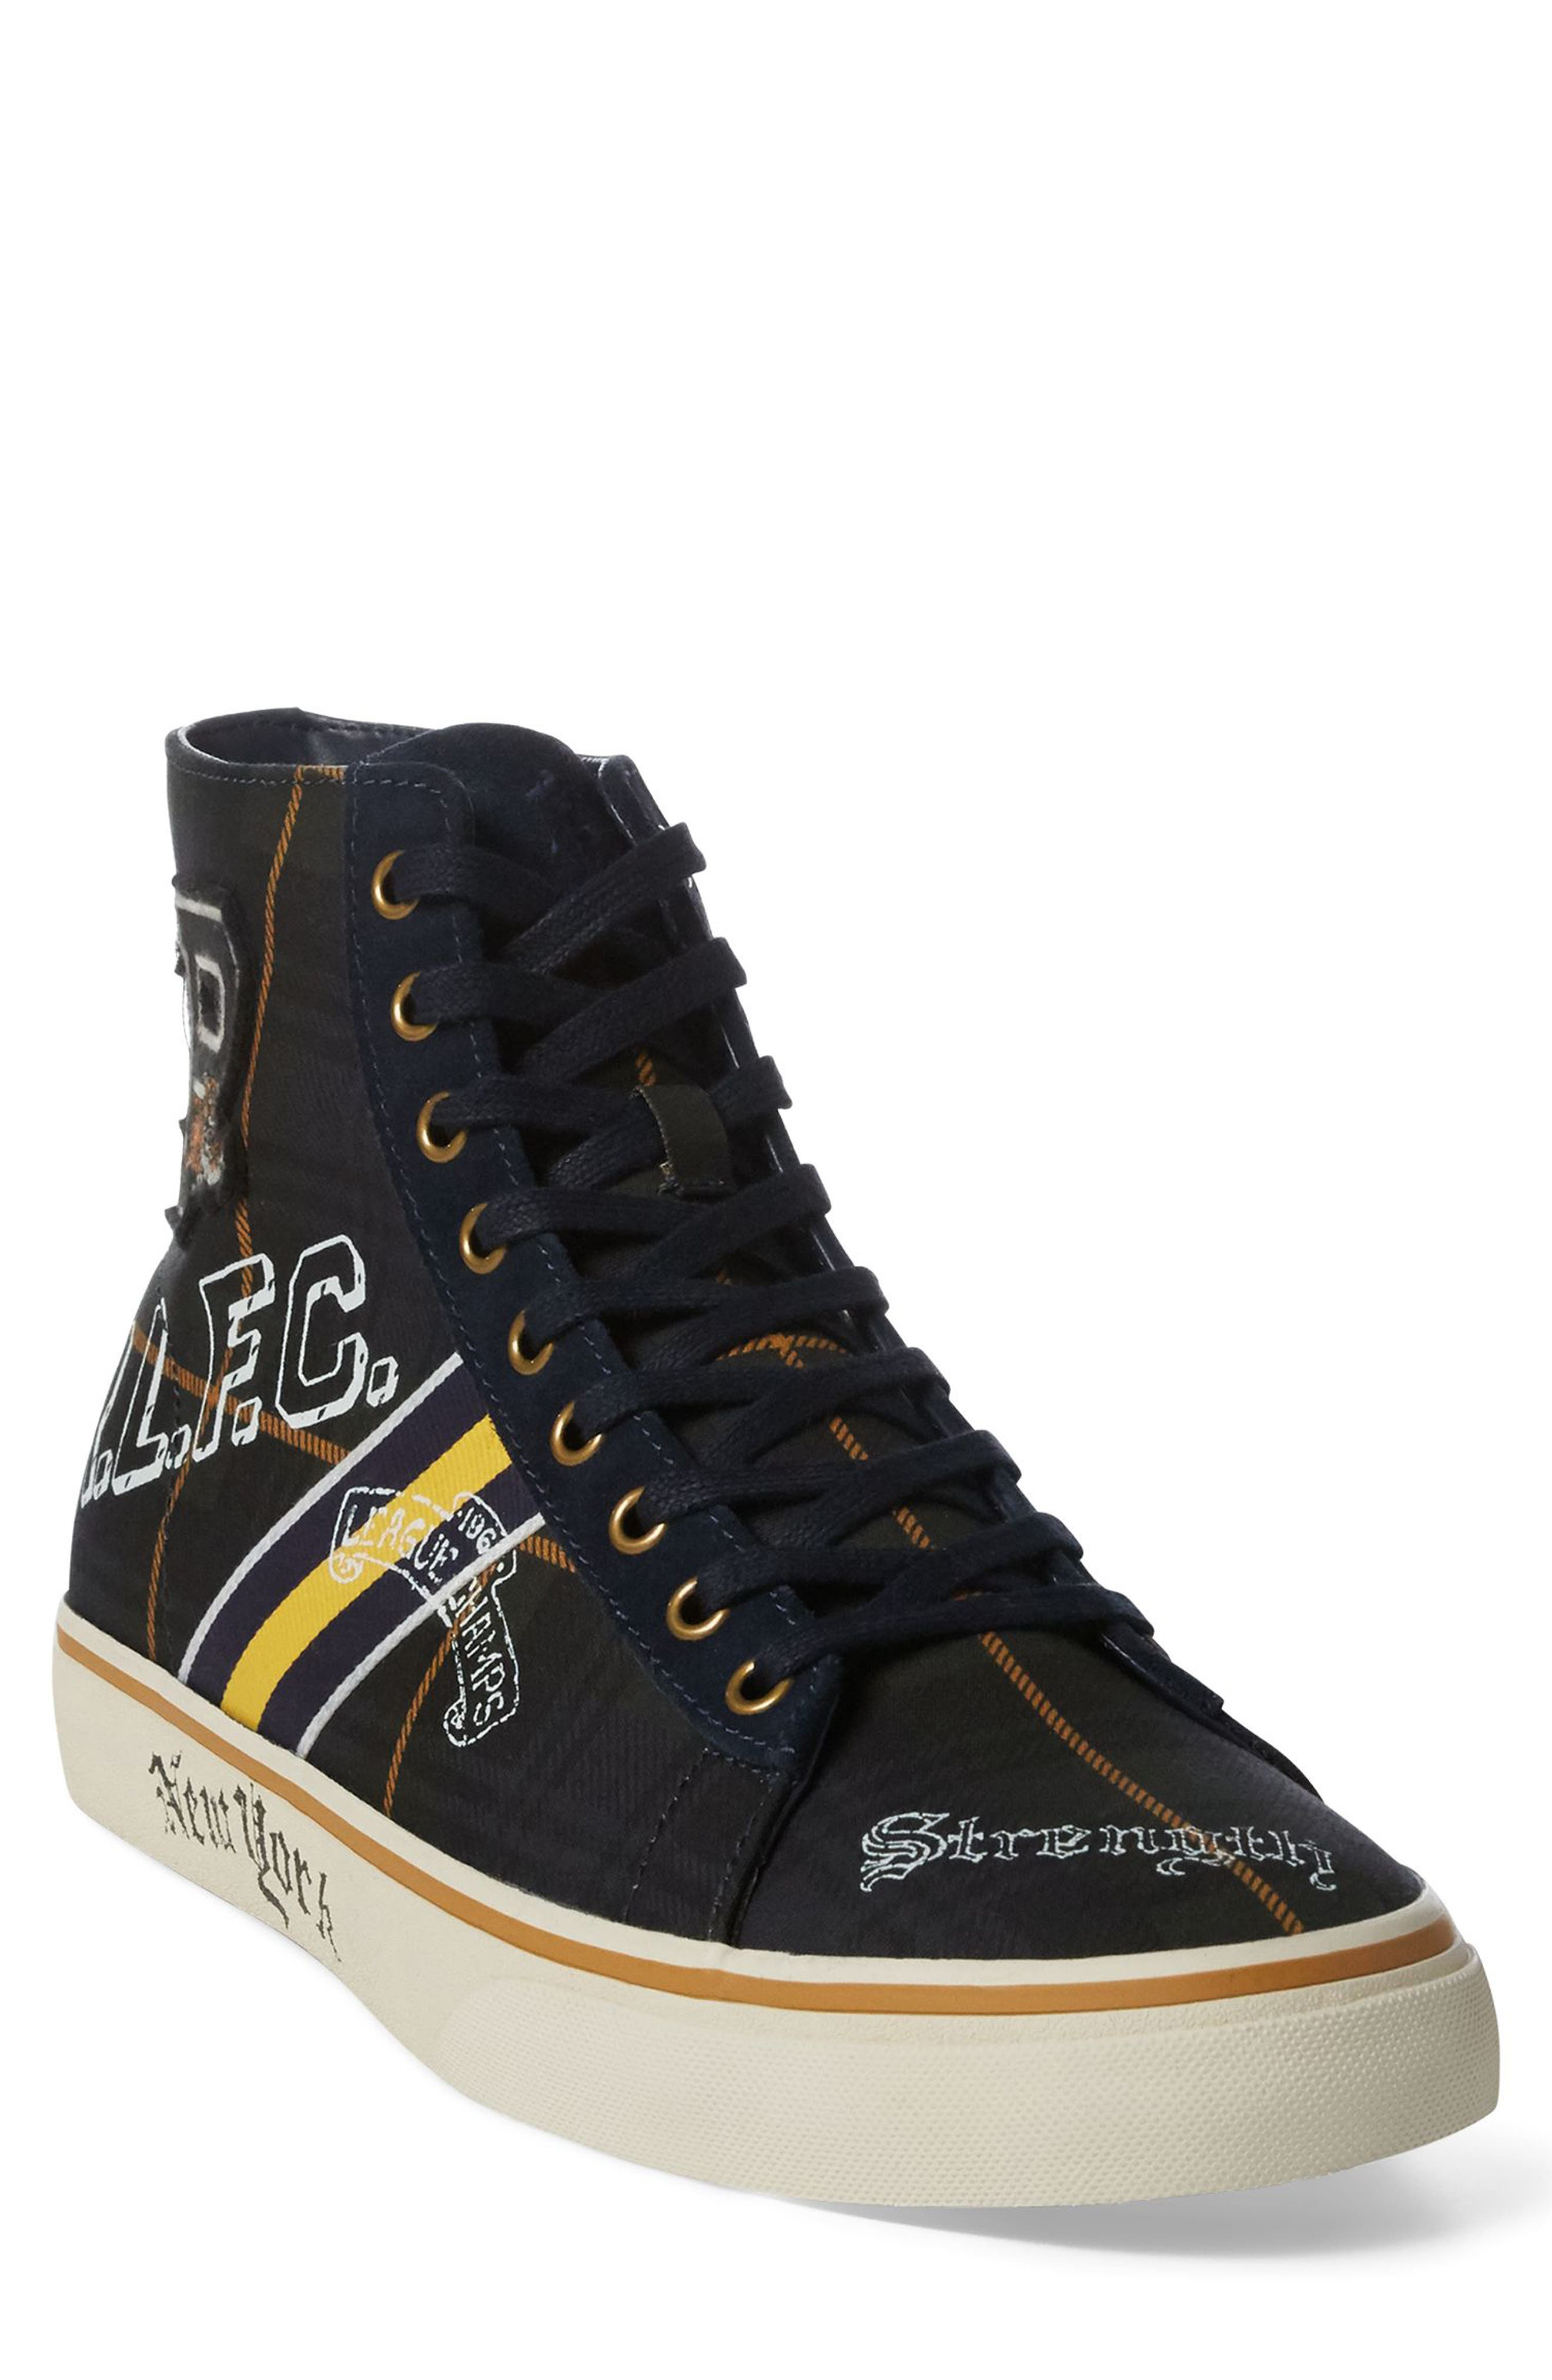 POLO RALPH LAUREN Solomon II Sneaker, Main, color, MULTI BLACK/ YELLOW CANVAS